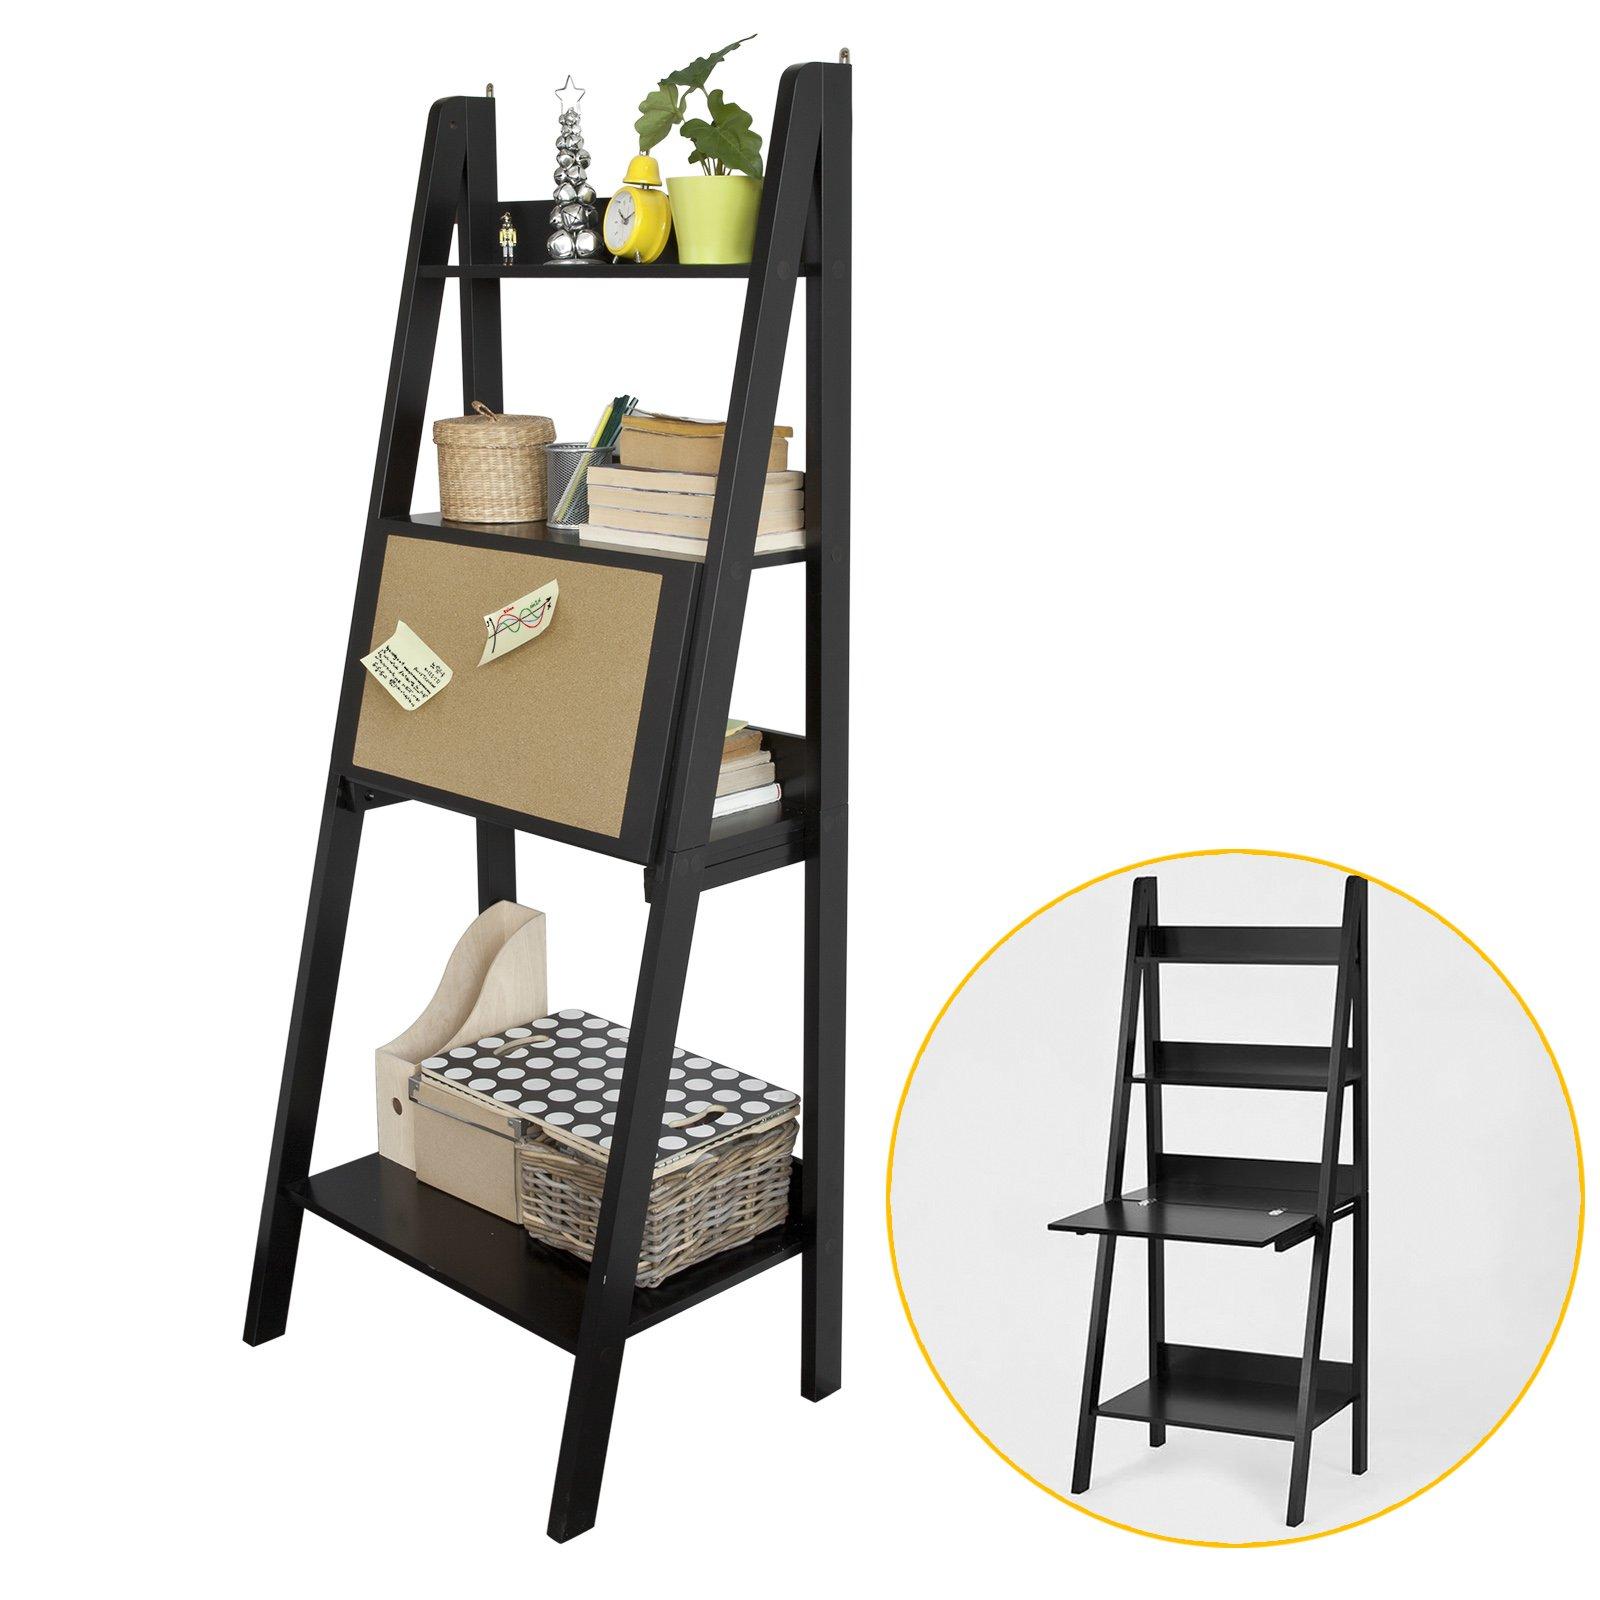 Buy Haotian Wood Modern Ladder Bookcase Book Shelf Free Stand Shelf With Memo Board Wall Shelf Desk Black Frg115 Sch In Cheap Price On Alibaba Com